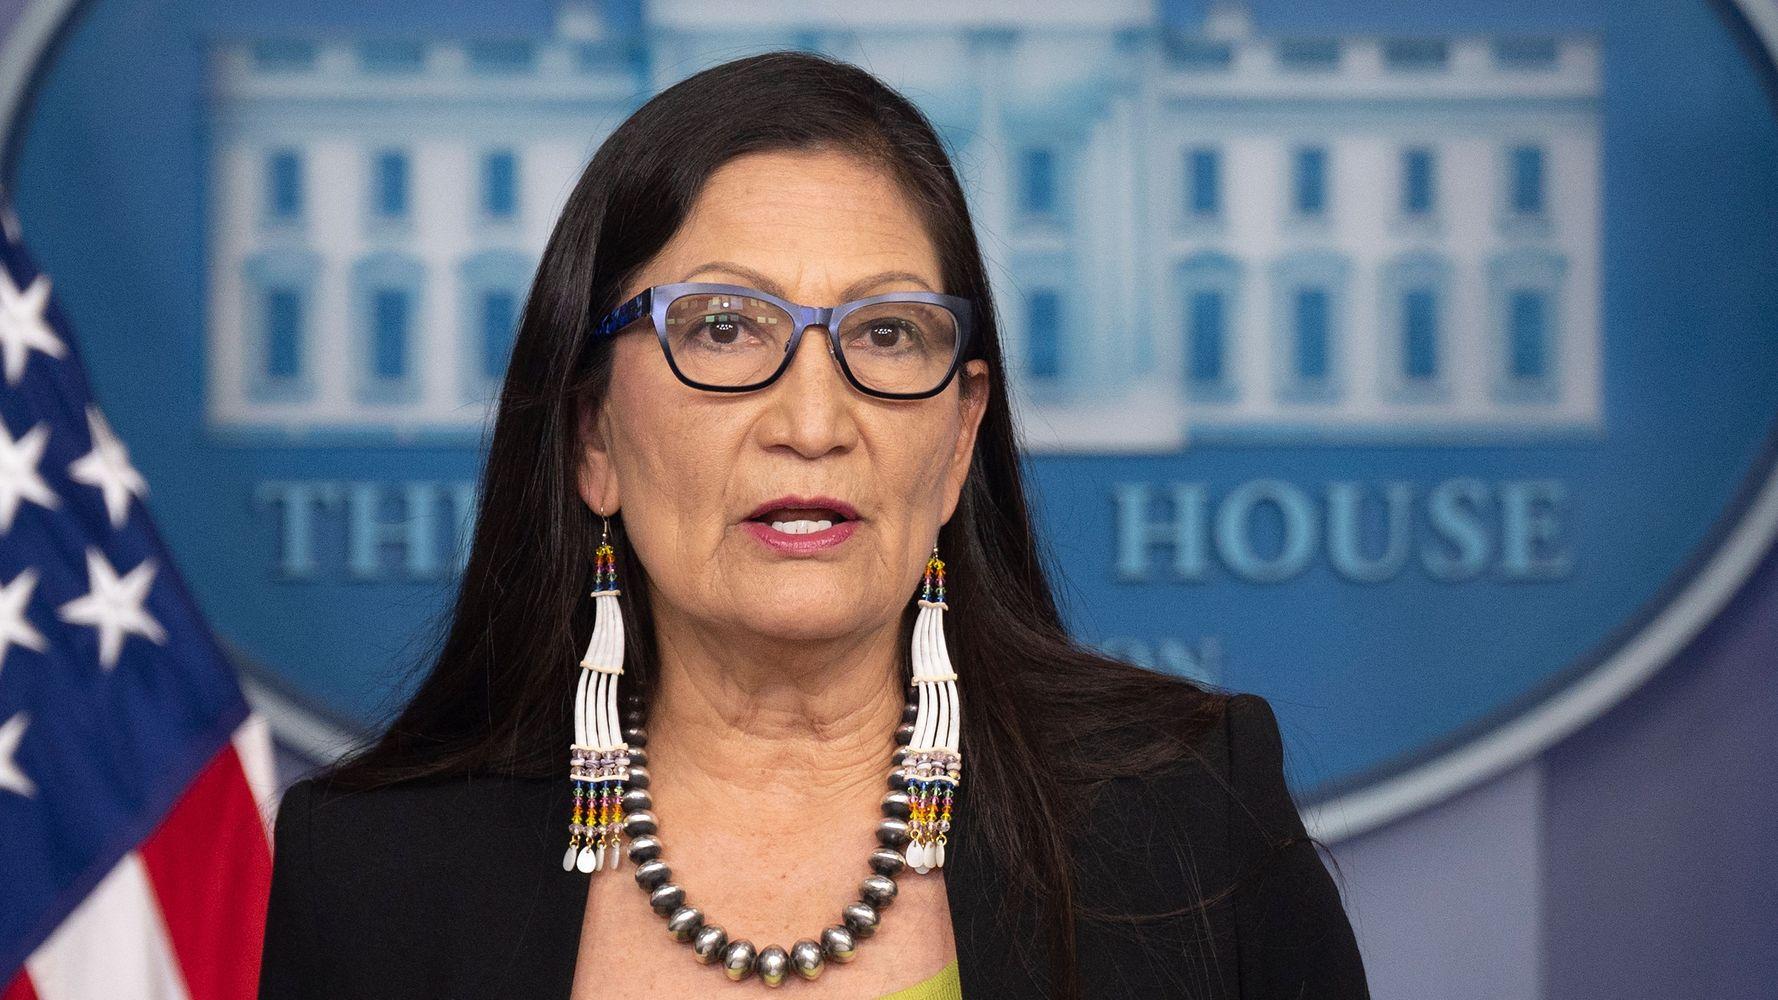 Deb Haaland: 'Unfortunate' That Rick Santorum Doesn't Know Native American History